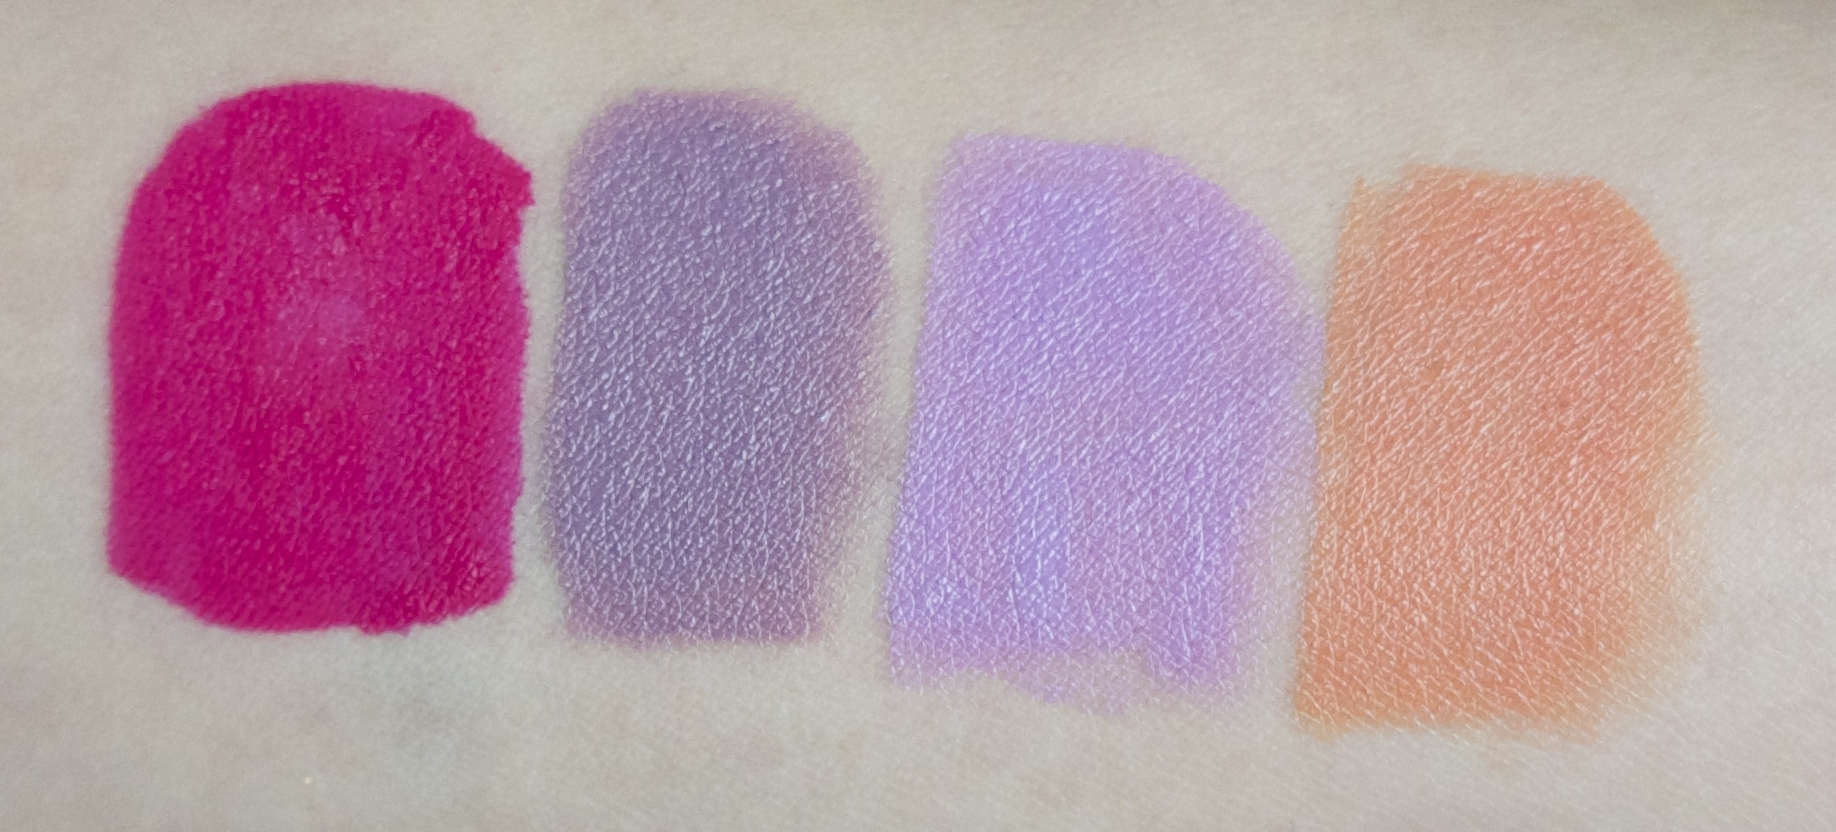 Lime Crime - Velvetine(Pink Velvet), Lipstick (Chinchilla), Lipstick (D'Lilac), Lipstick (Cosmopop)